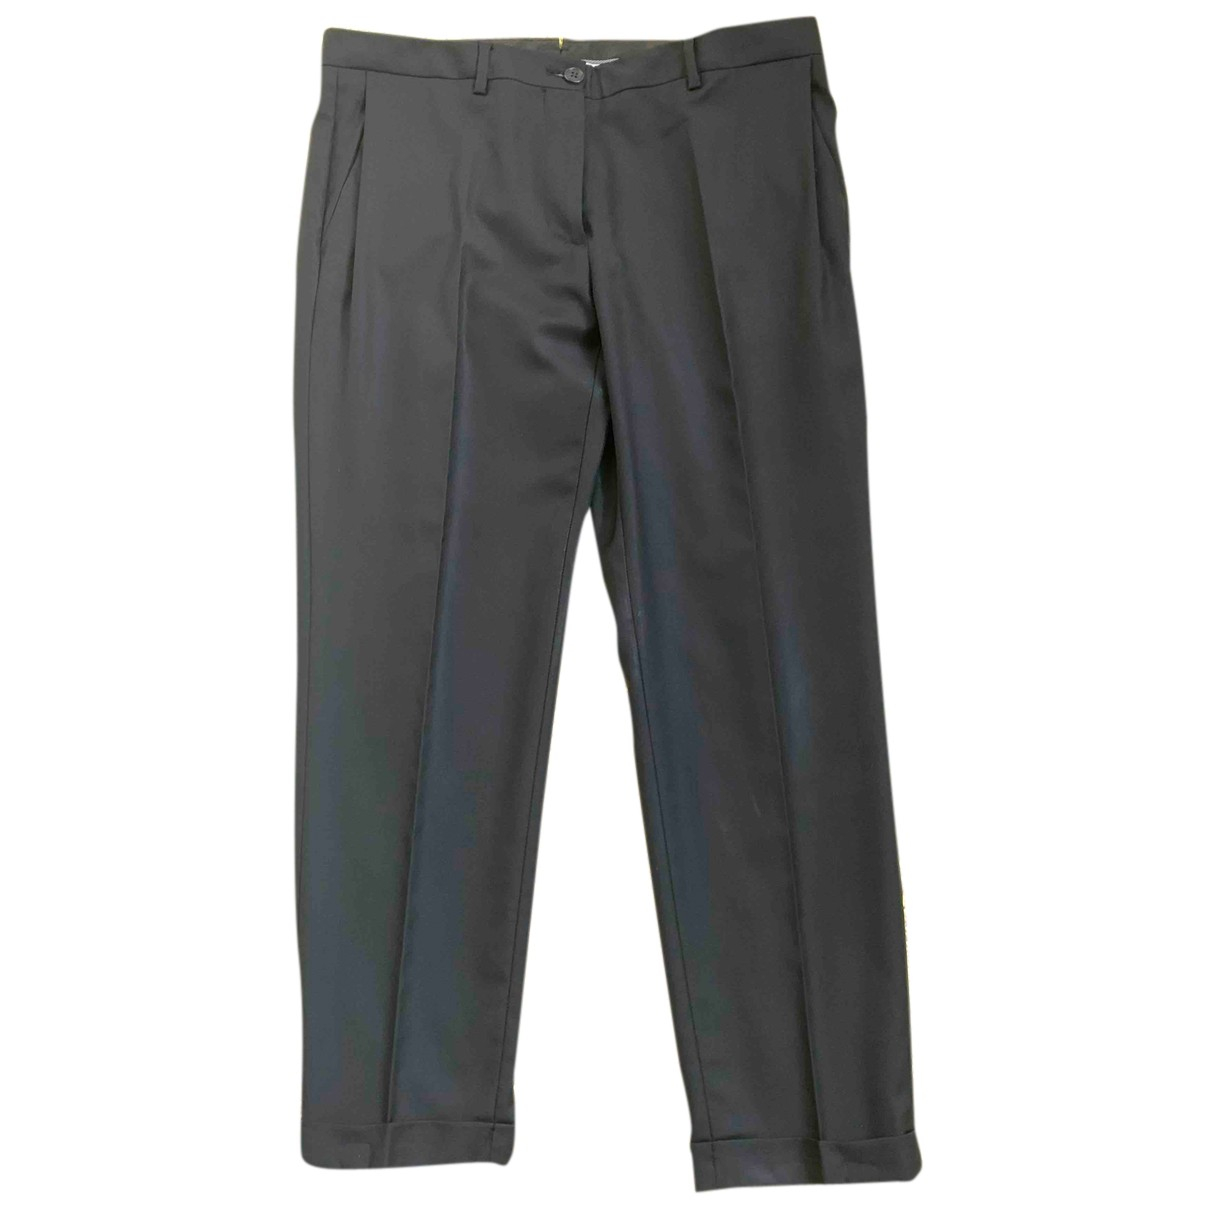 Mauro Grifoni N Black Wool Trousers for Women 42 IT